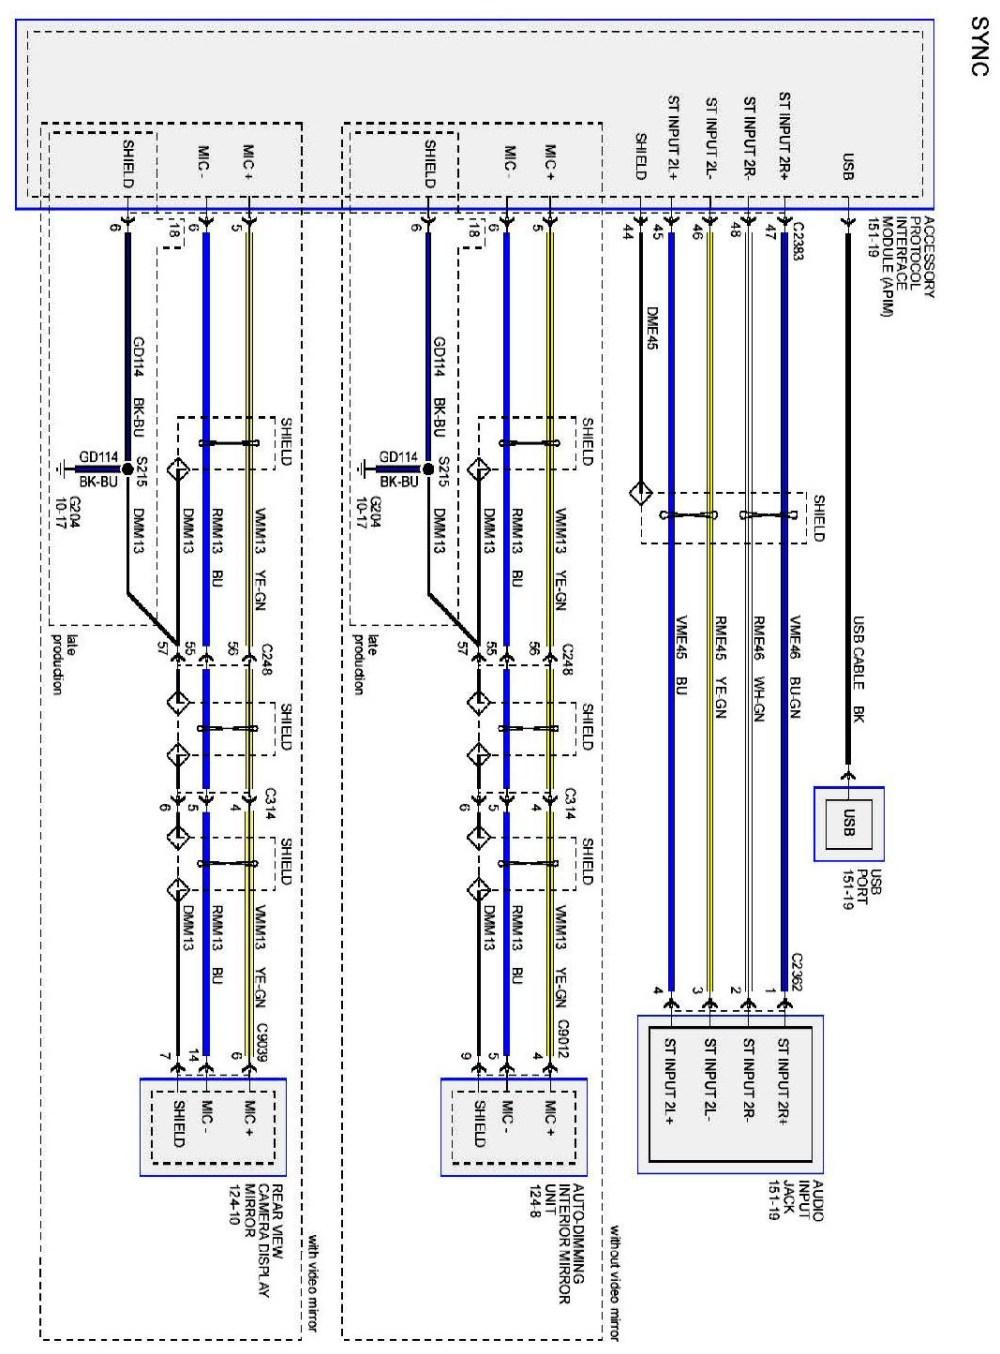 medium resolution of 2013 ford f150 radio wiring diagram download ford radio wiring diagram 2006 f150 beautiful f